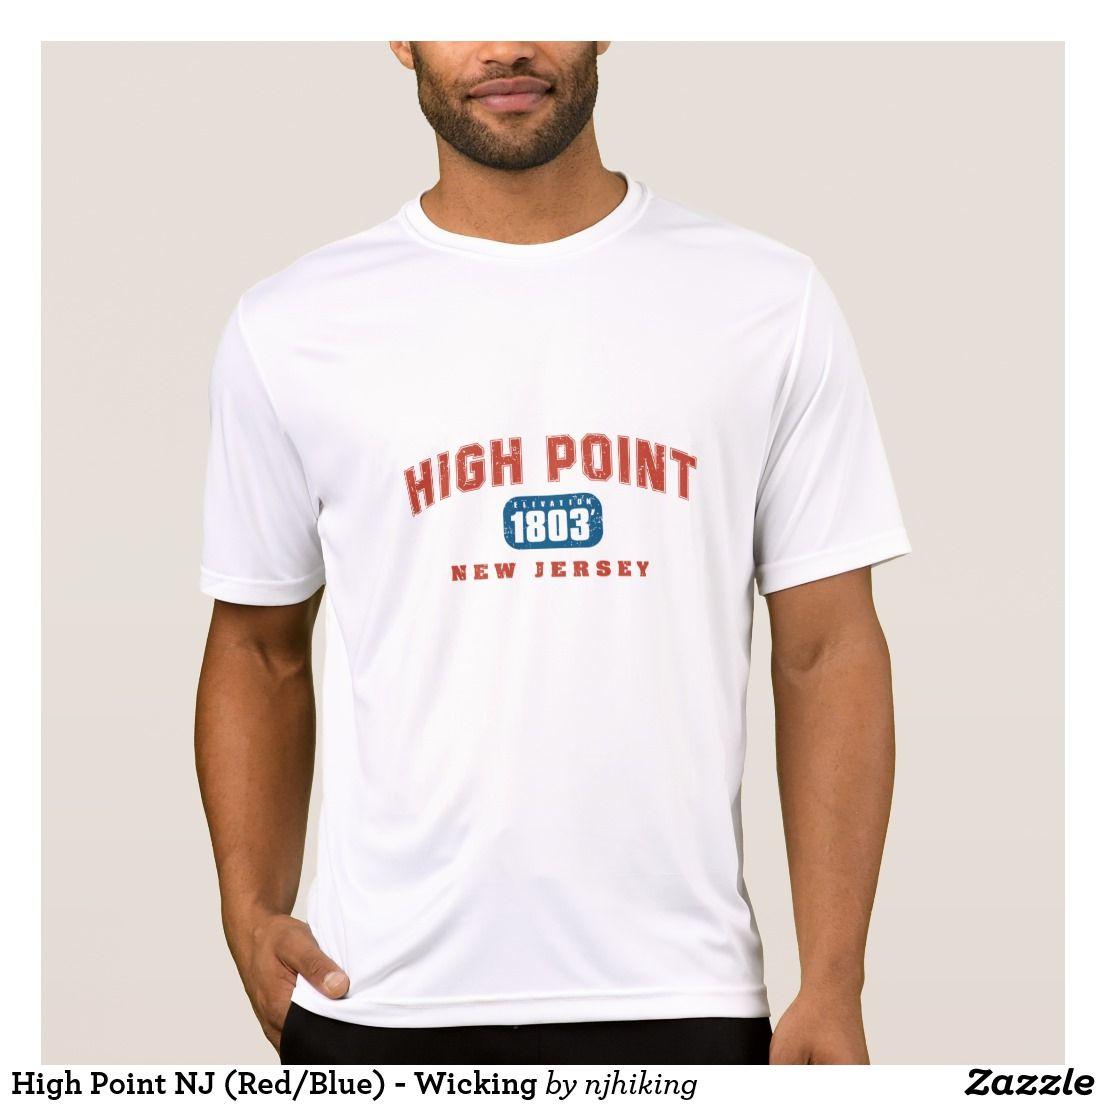 High Point NJ (Red/Blue) Wicking TShirt